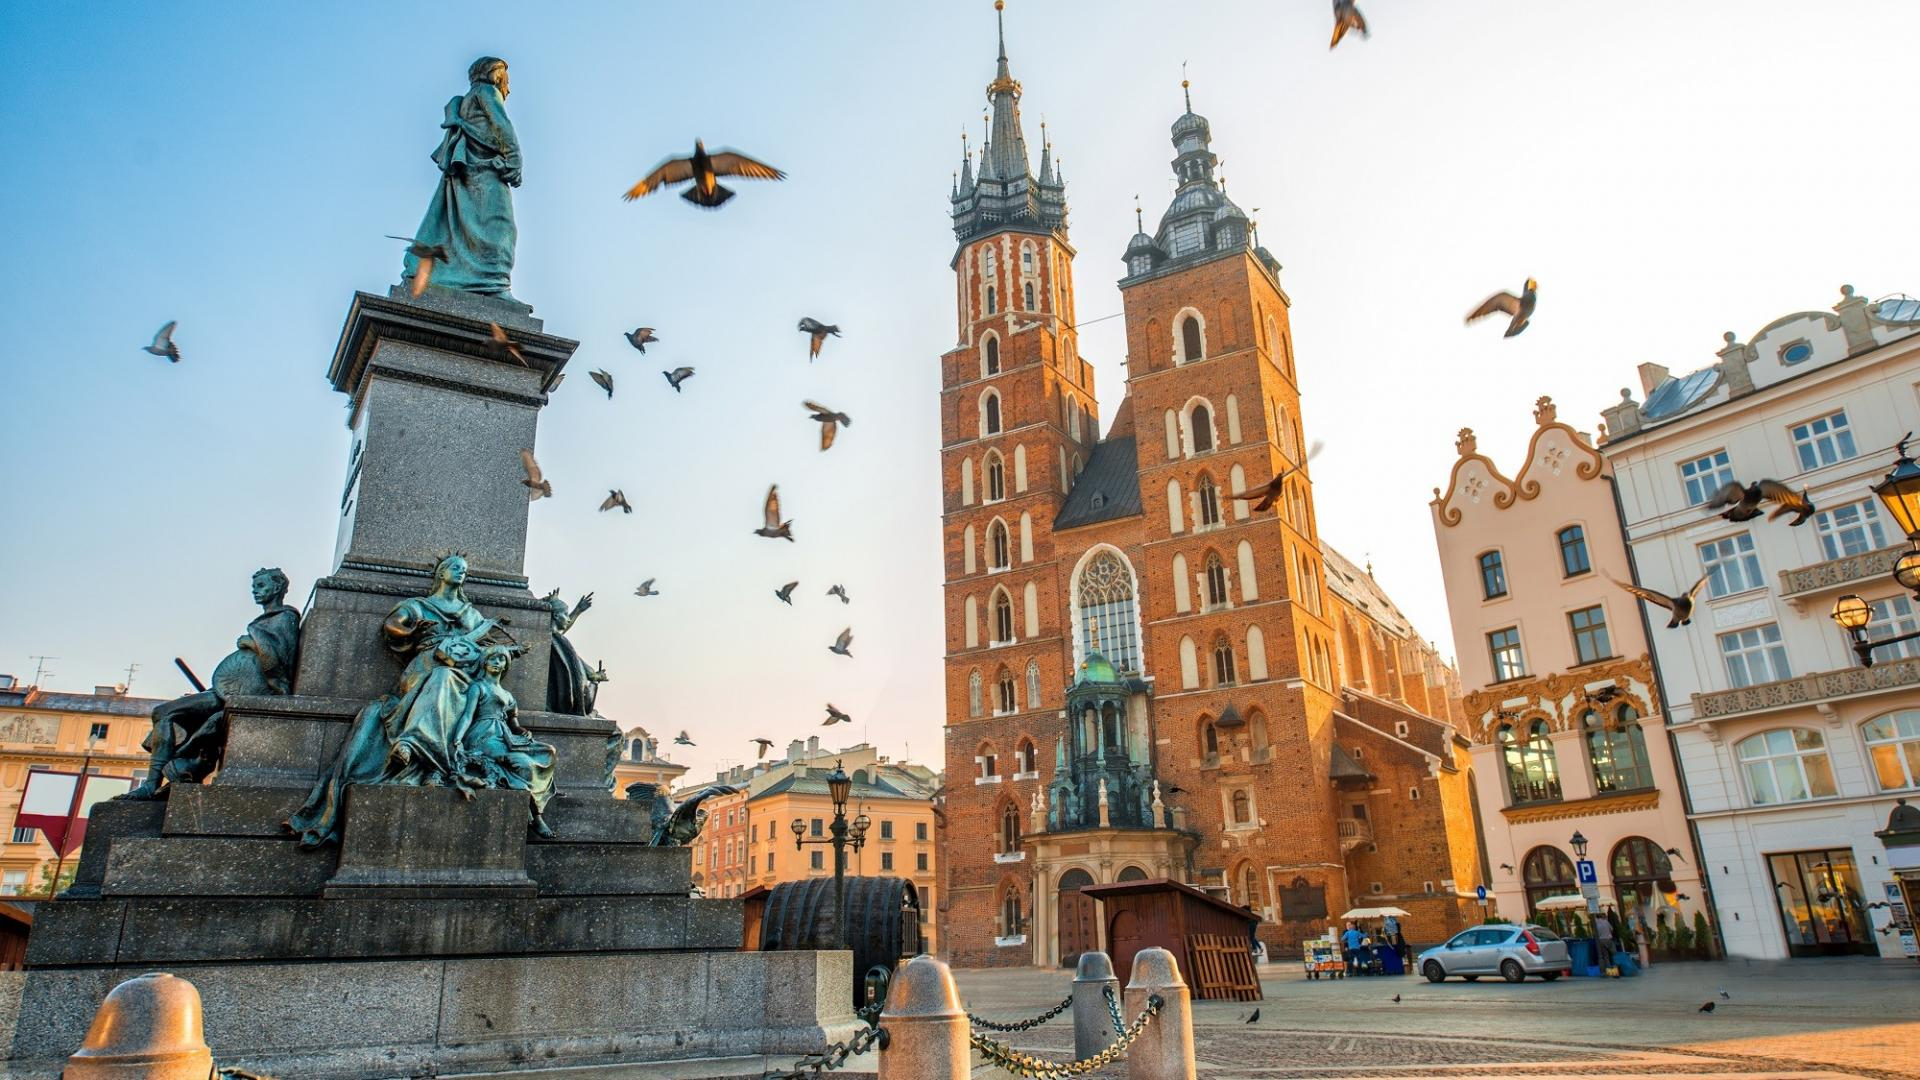 Dagaanbieding - 4-daagse stedentrip Krakau incl. vlucht en hotel dagelijkse koopjes